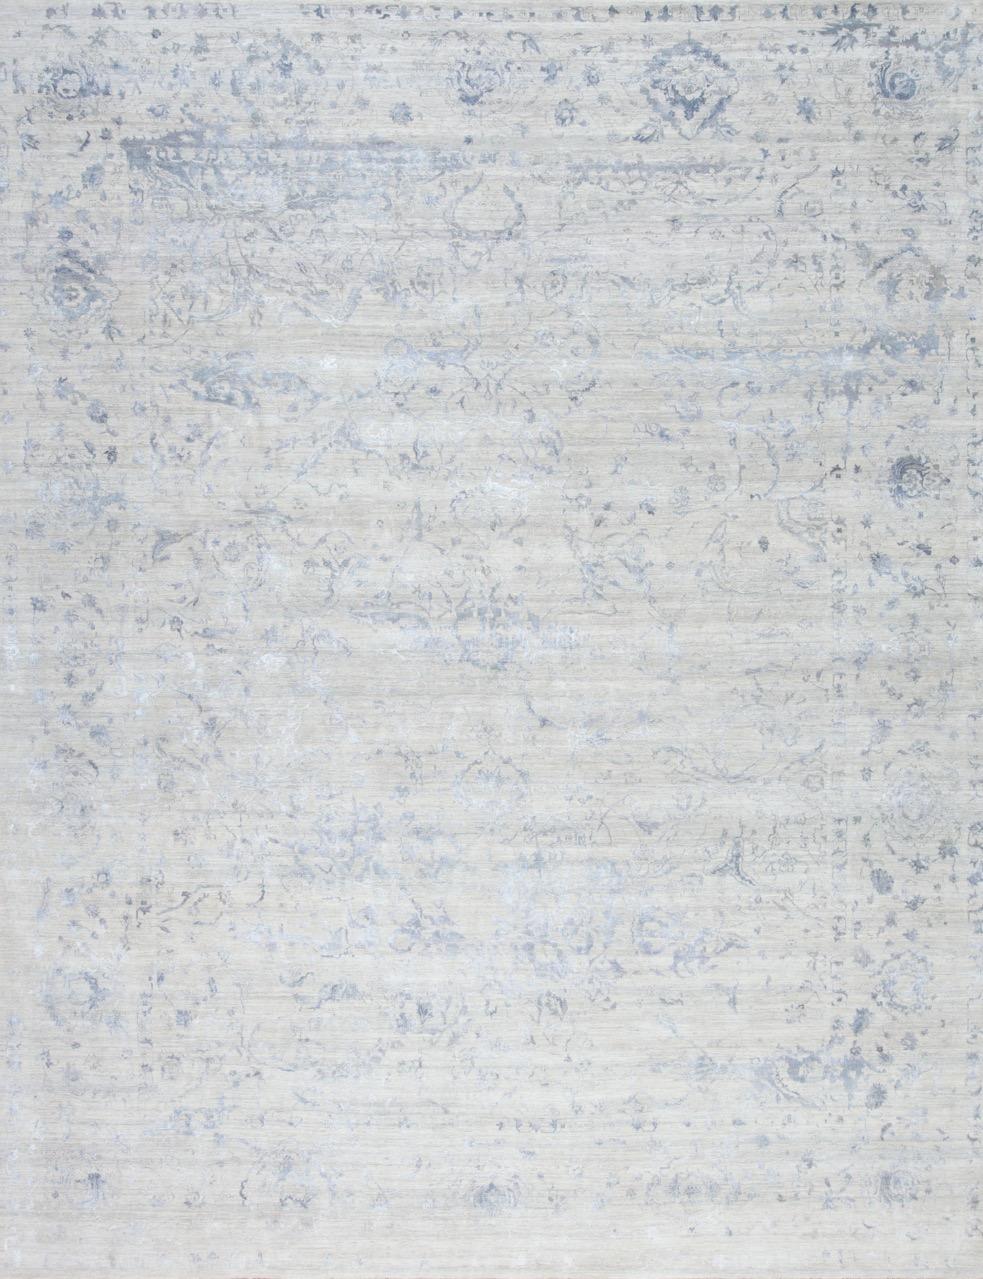 Amour Reserve - Blue - Hand Spun Wool and SilkCirca 2000'sSize Measurements: 467cm x 338cm